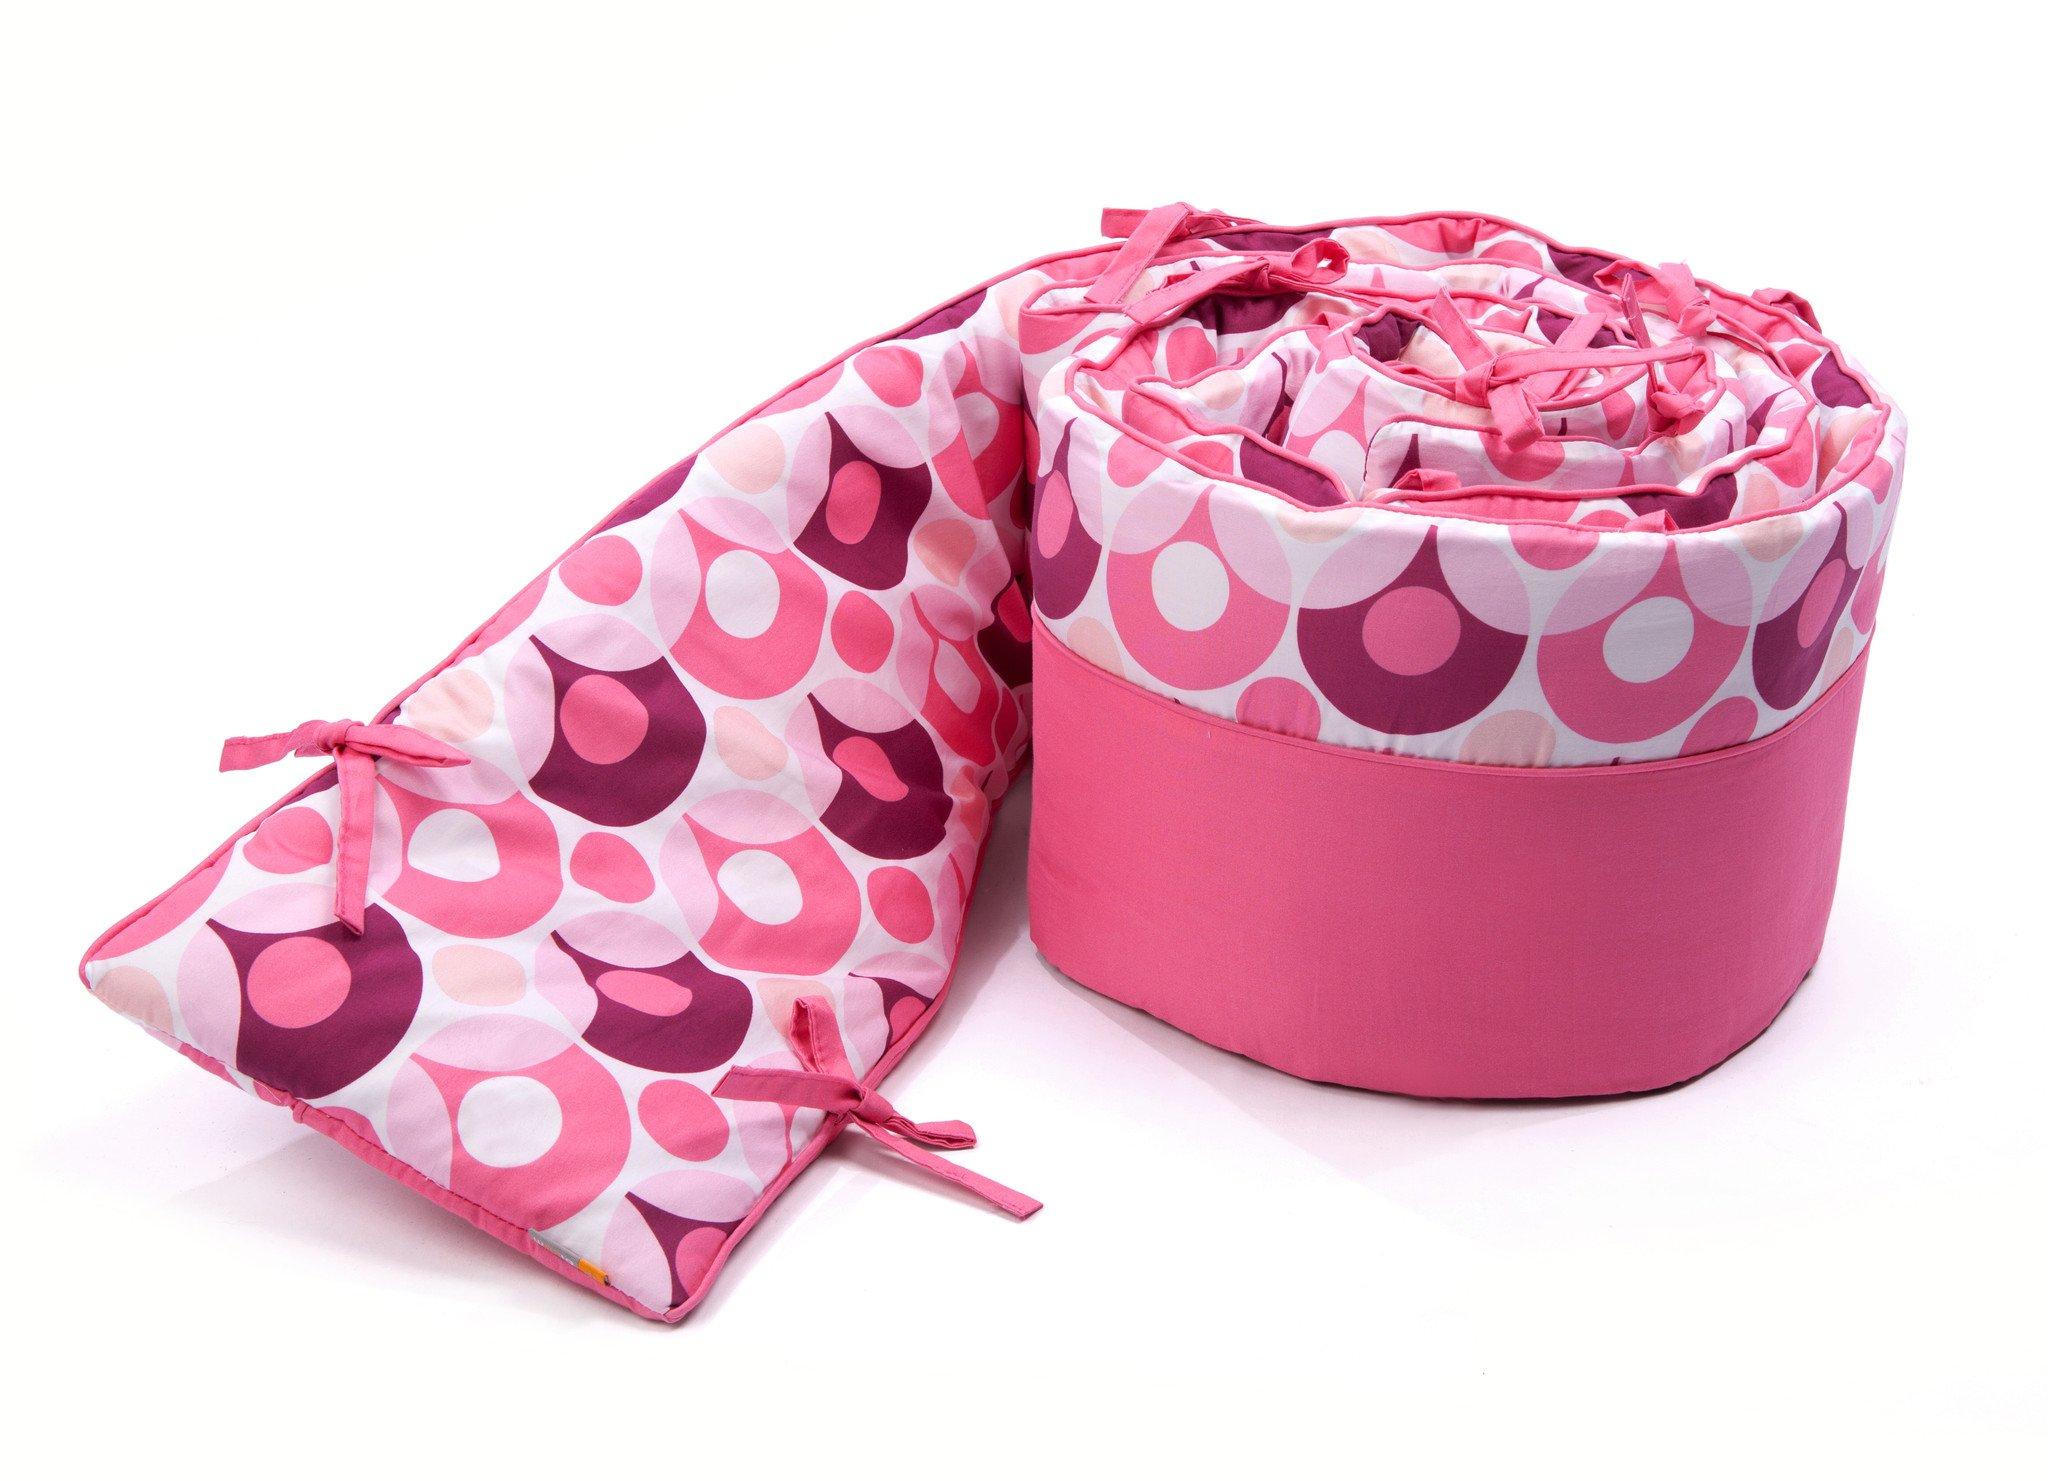 Bloom Luxo Lollipop Bumper, Rosy Pink